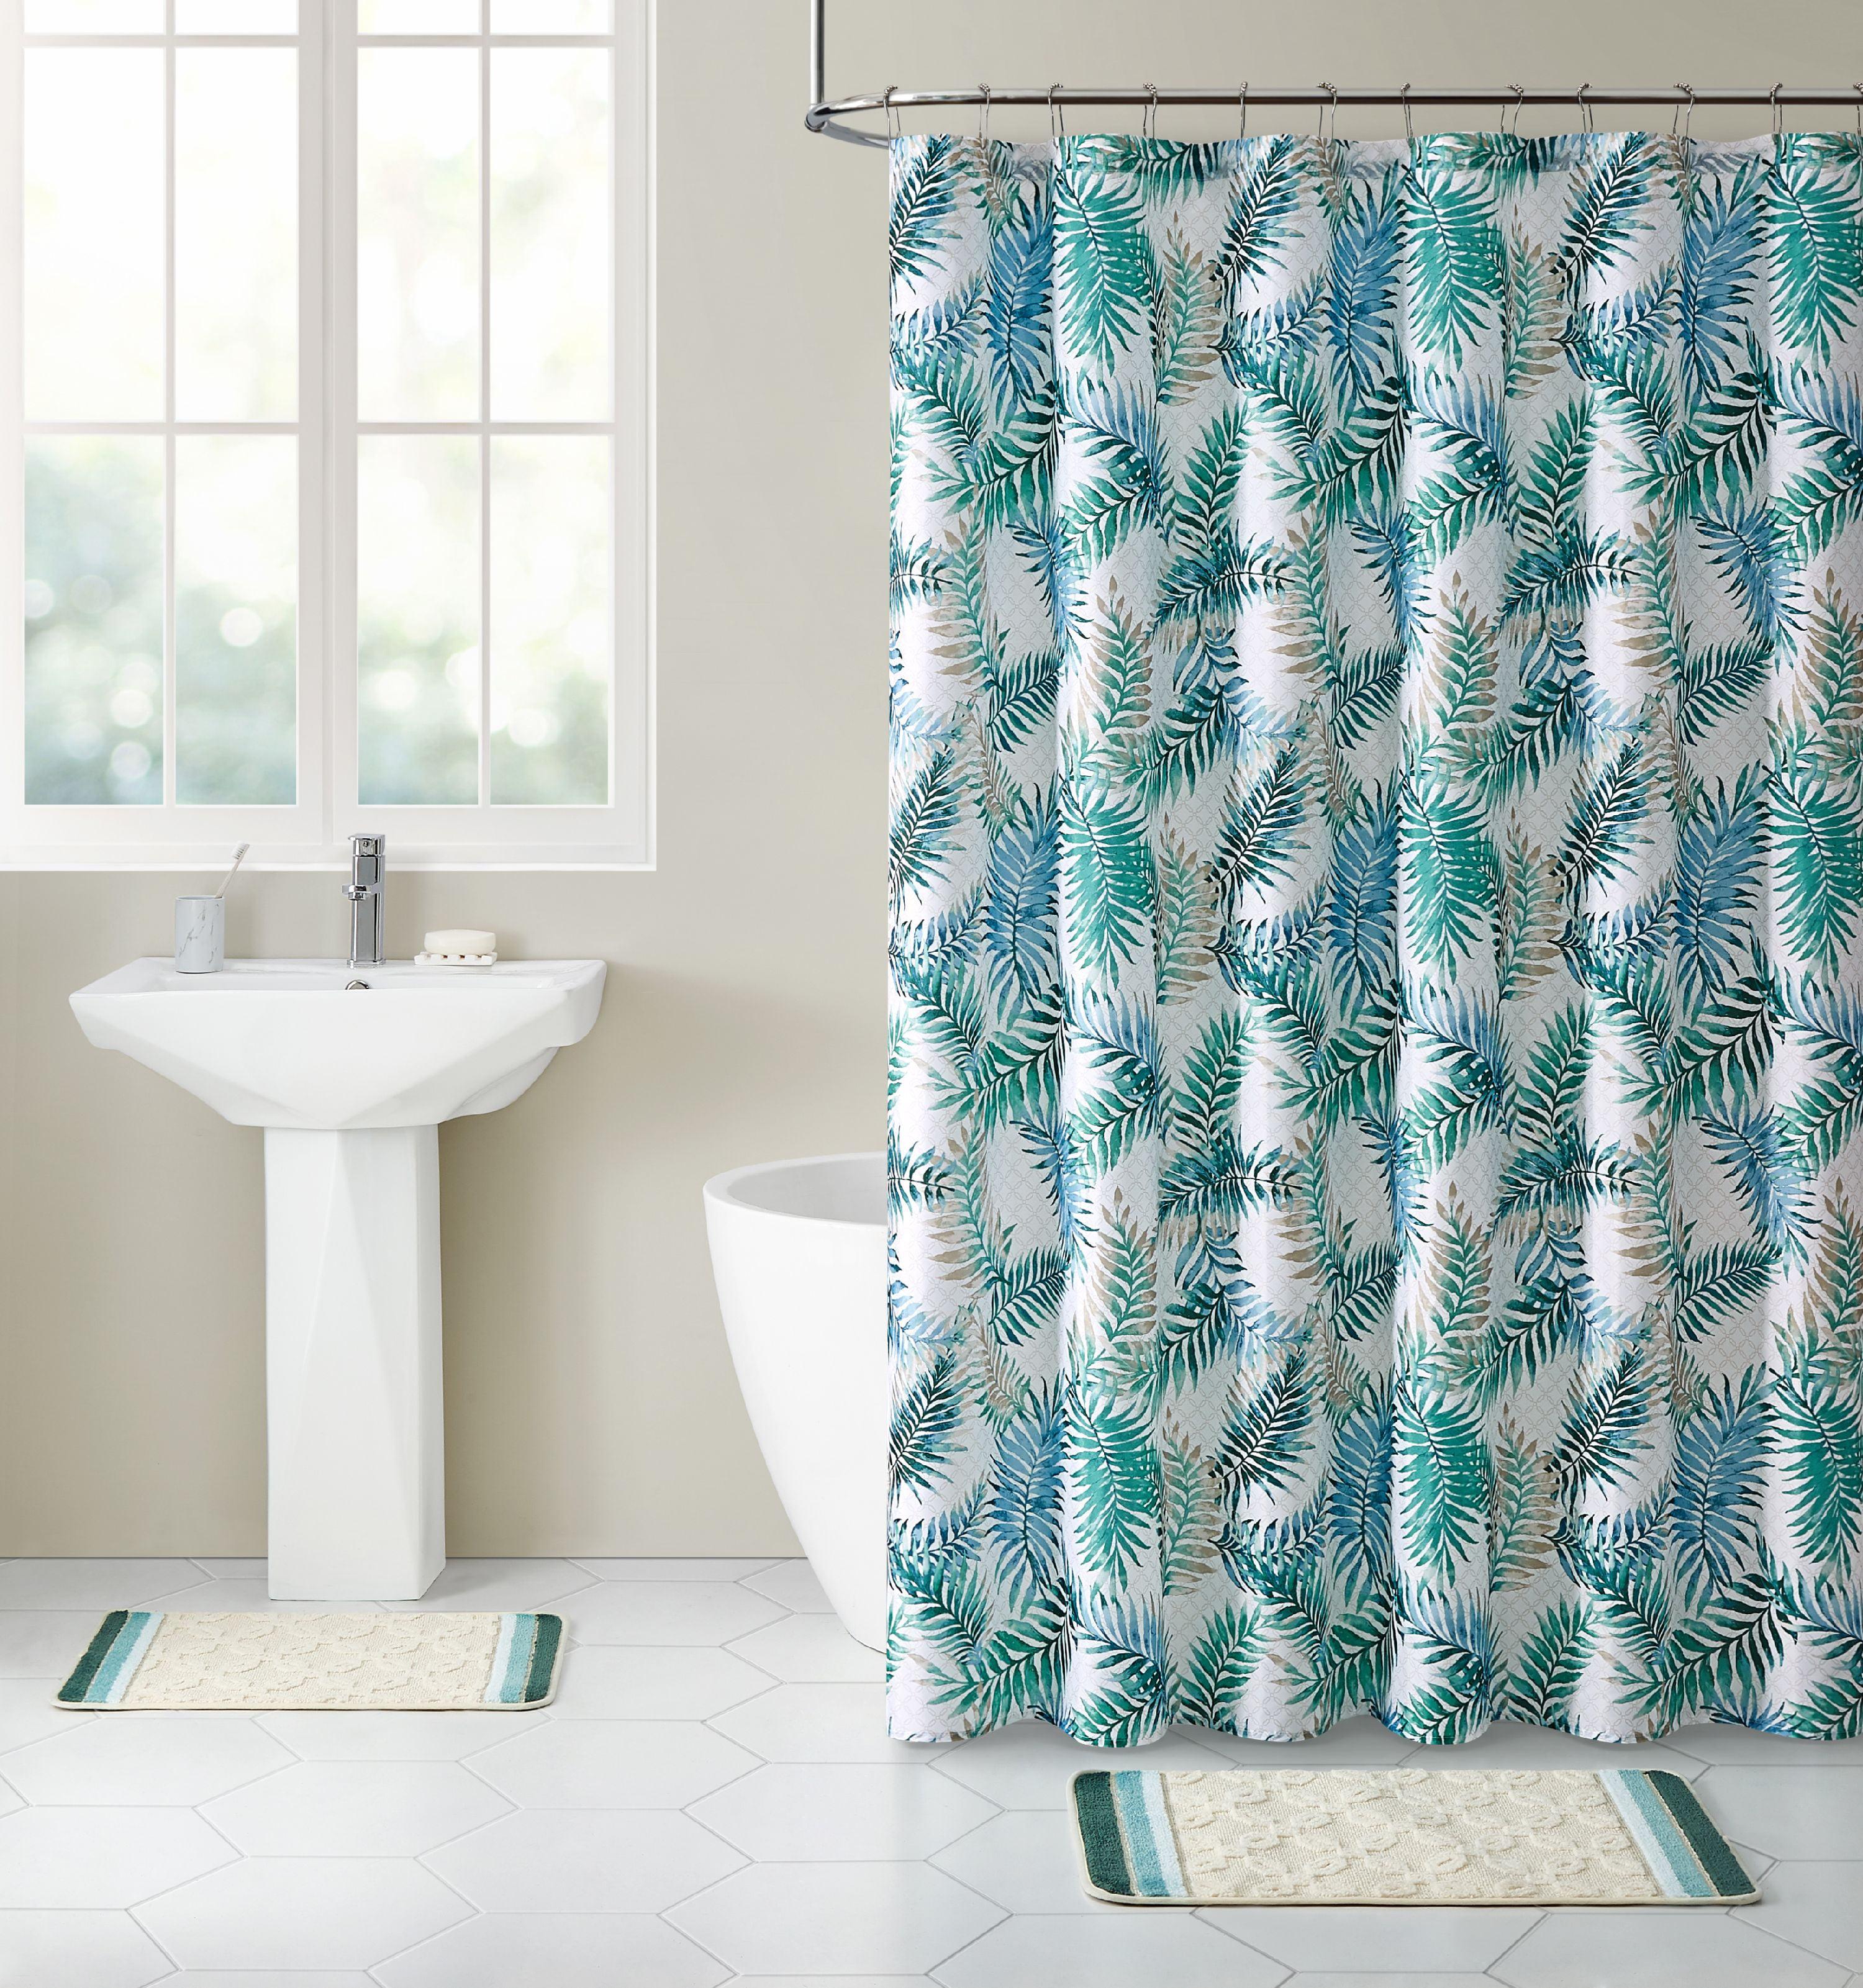 Mainstays BATHROOM SET Gray Blue SHOWER CURTAIN Hooks MICROFIBER TEXTURED RUG